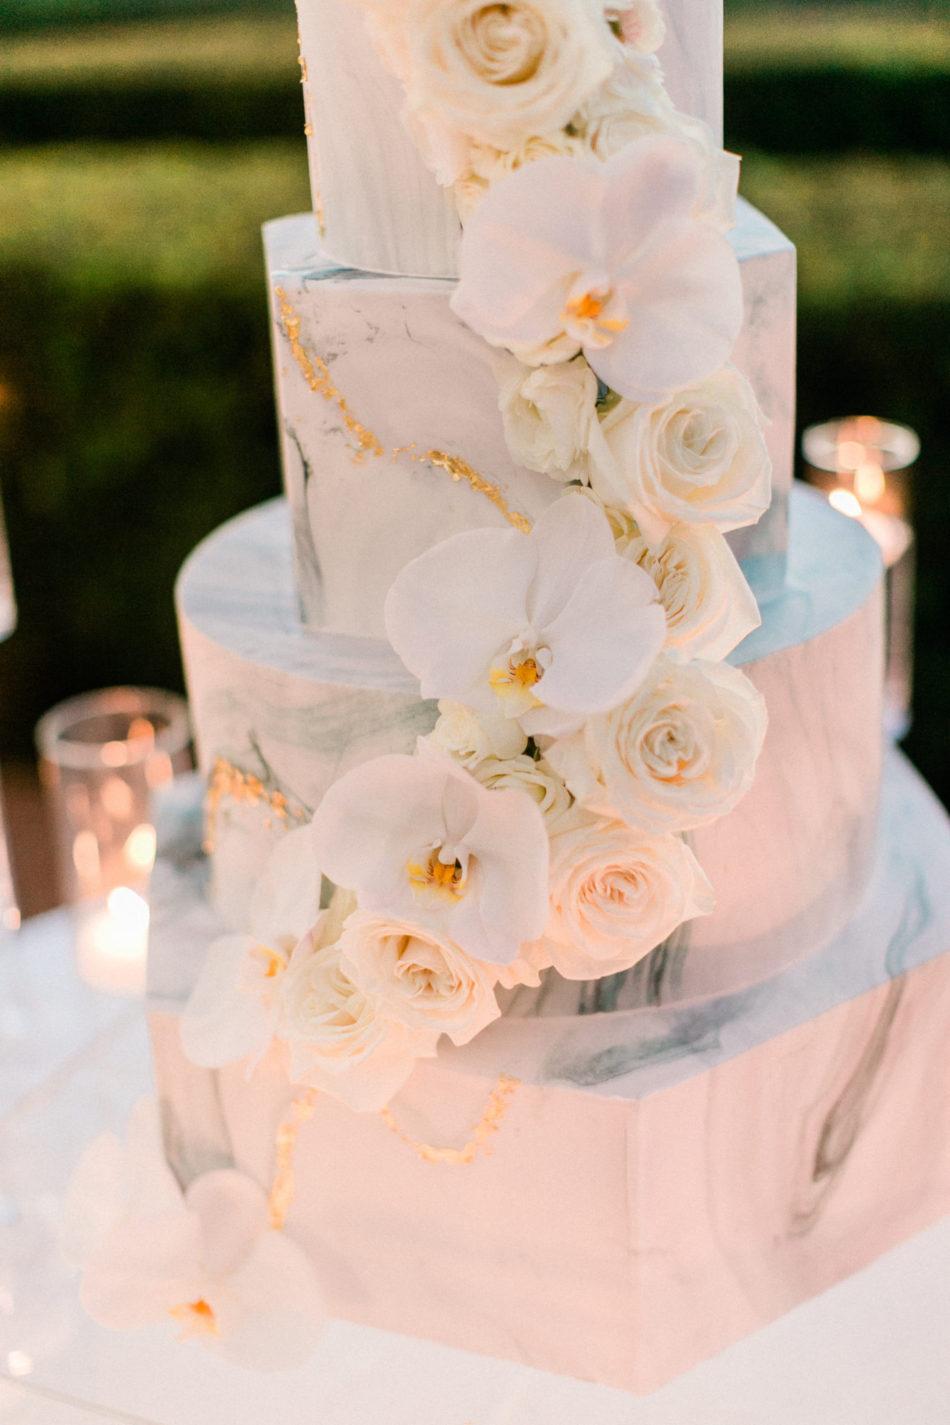 wedding cake, marble cake design, modern cake, floral design, florist, wedding florist, wedding flowers, orange county weddings, orange county wedding florist, orange county florist, orange county floral design, flowers by cina